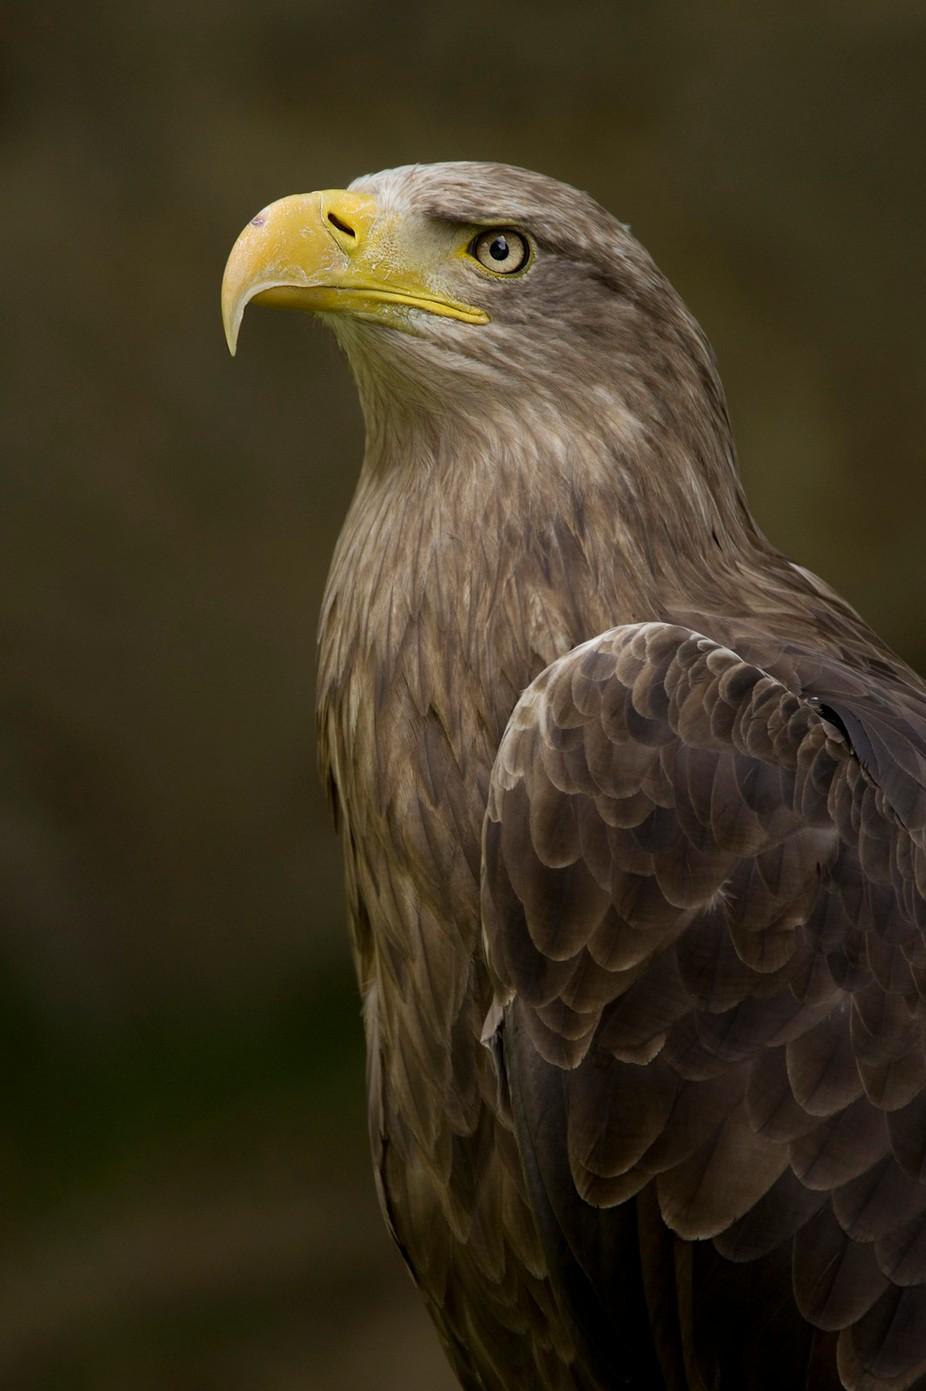 Eagle by aleoko - Just Eagles Photo Contest